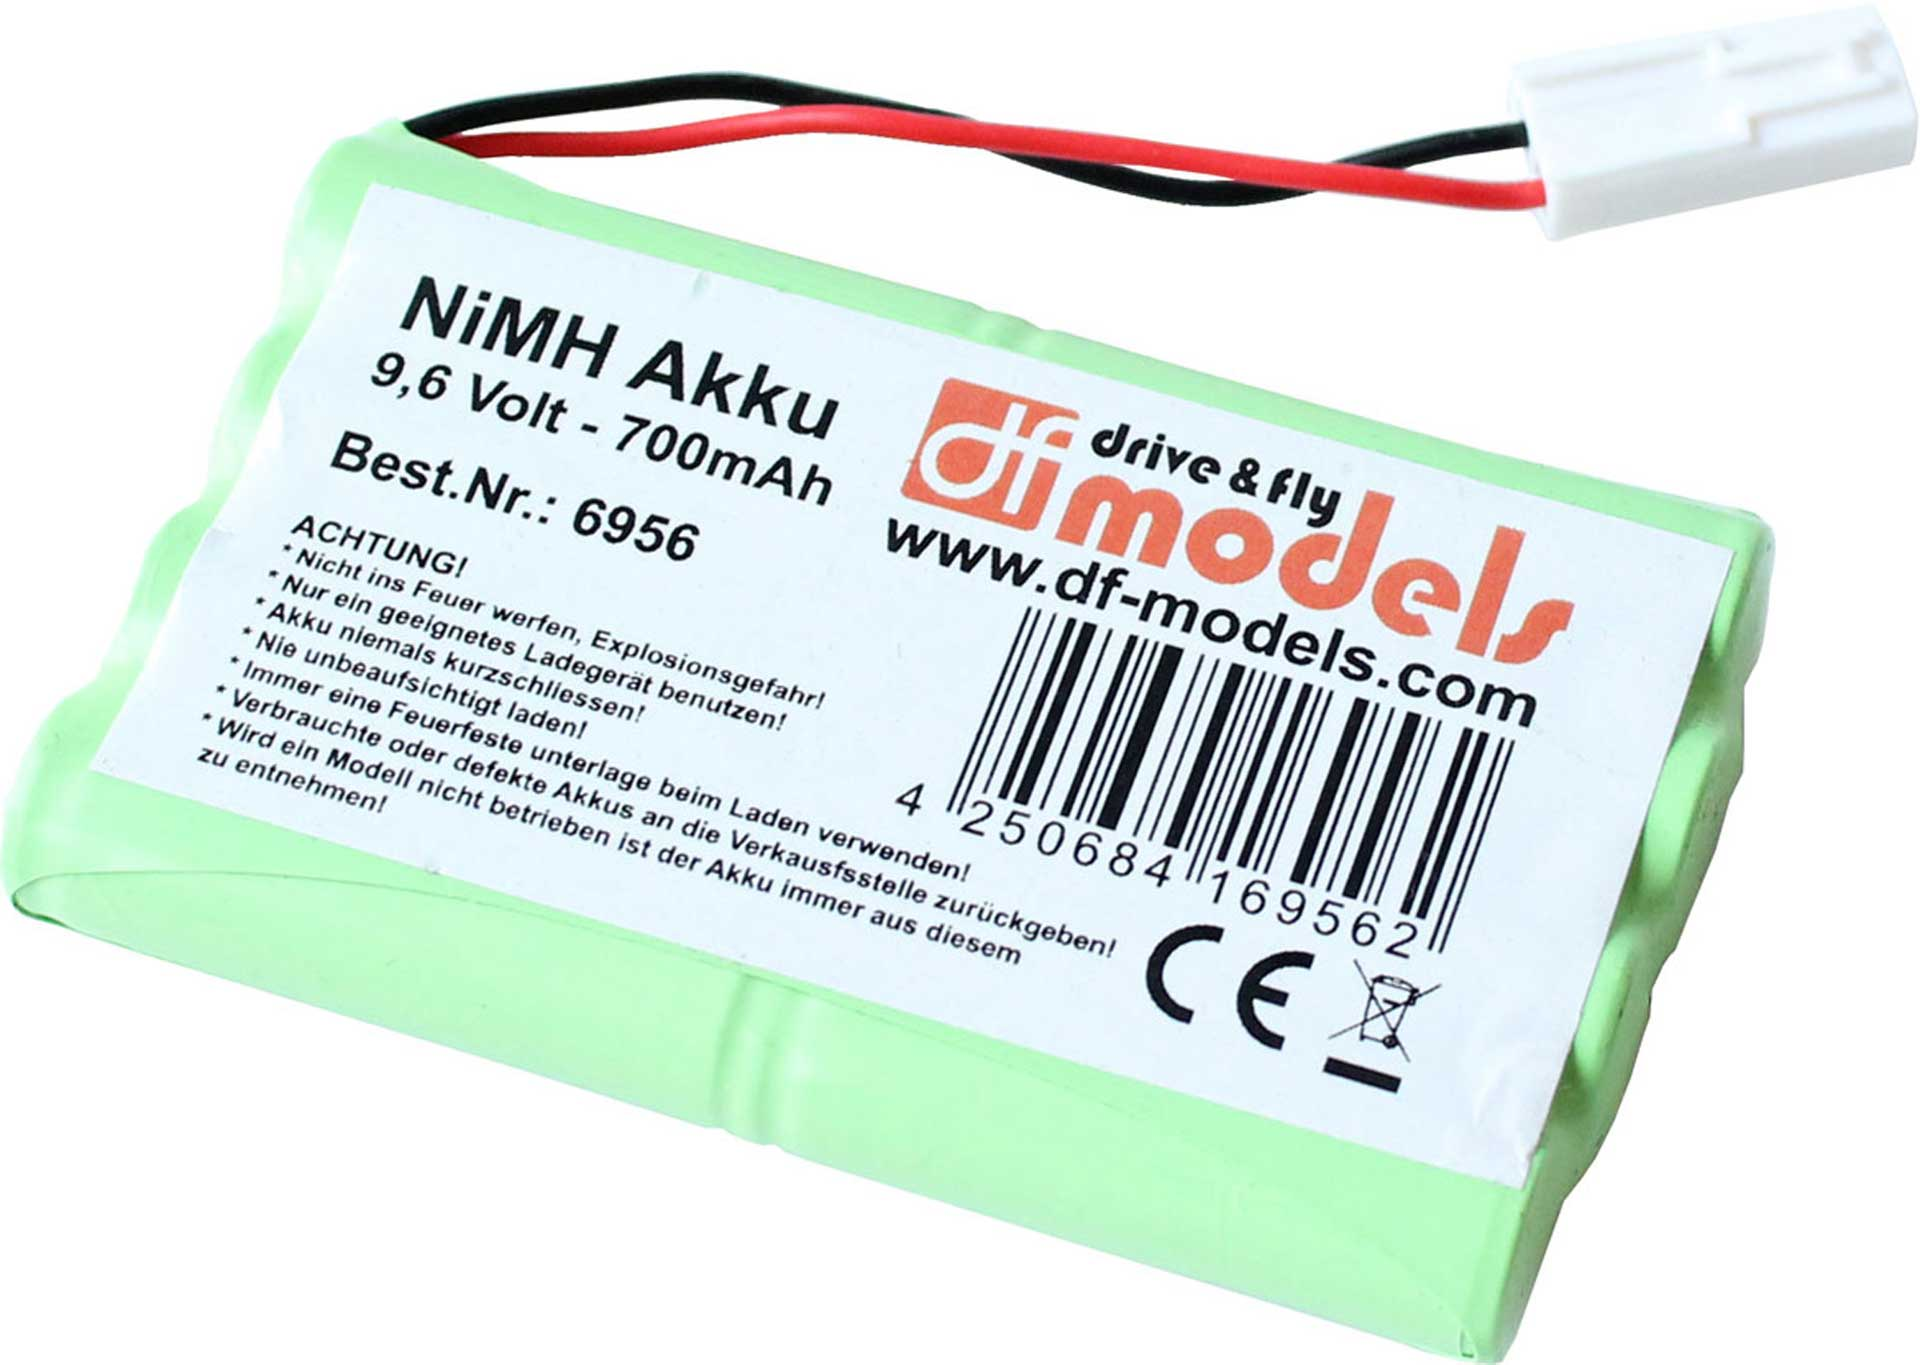 DRIVE & FLY MODELS NIMH AKKU 9,6V 700MAH